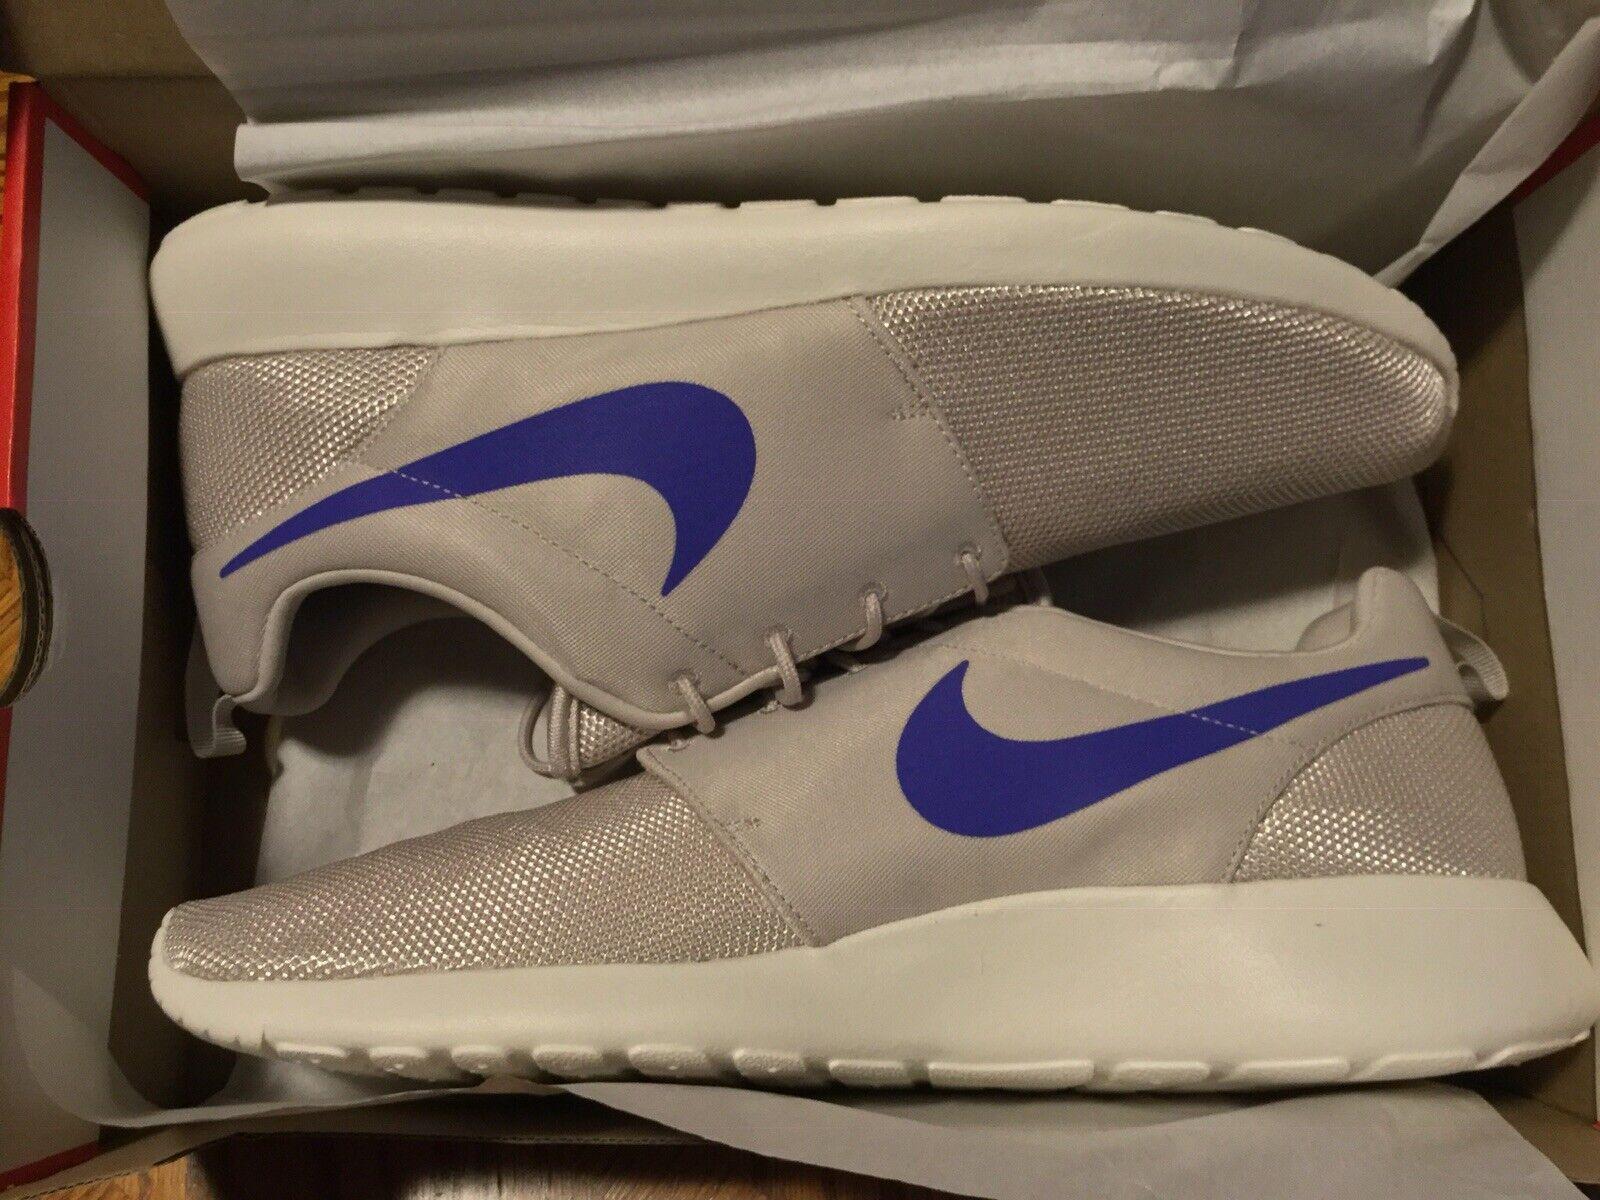 info for c1d46 5fd0a NEW Men's NIKE ROSHE ONE Desert Sand Persian purple Size 13  nqvyya4552-Athletic Shoes